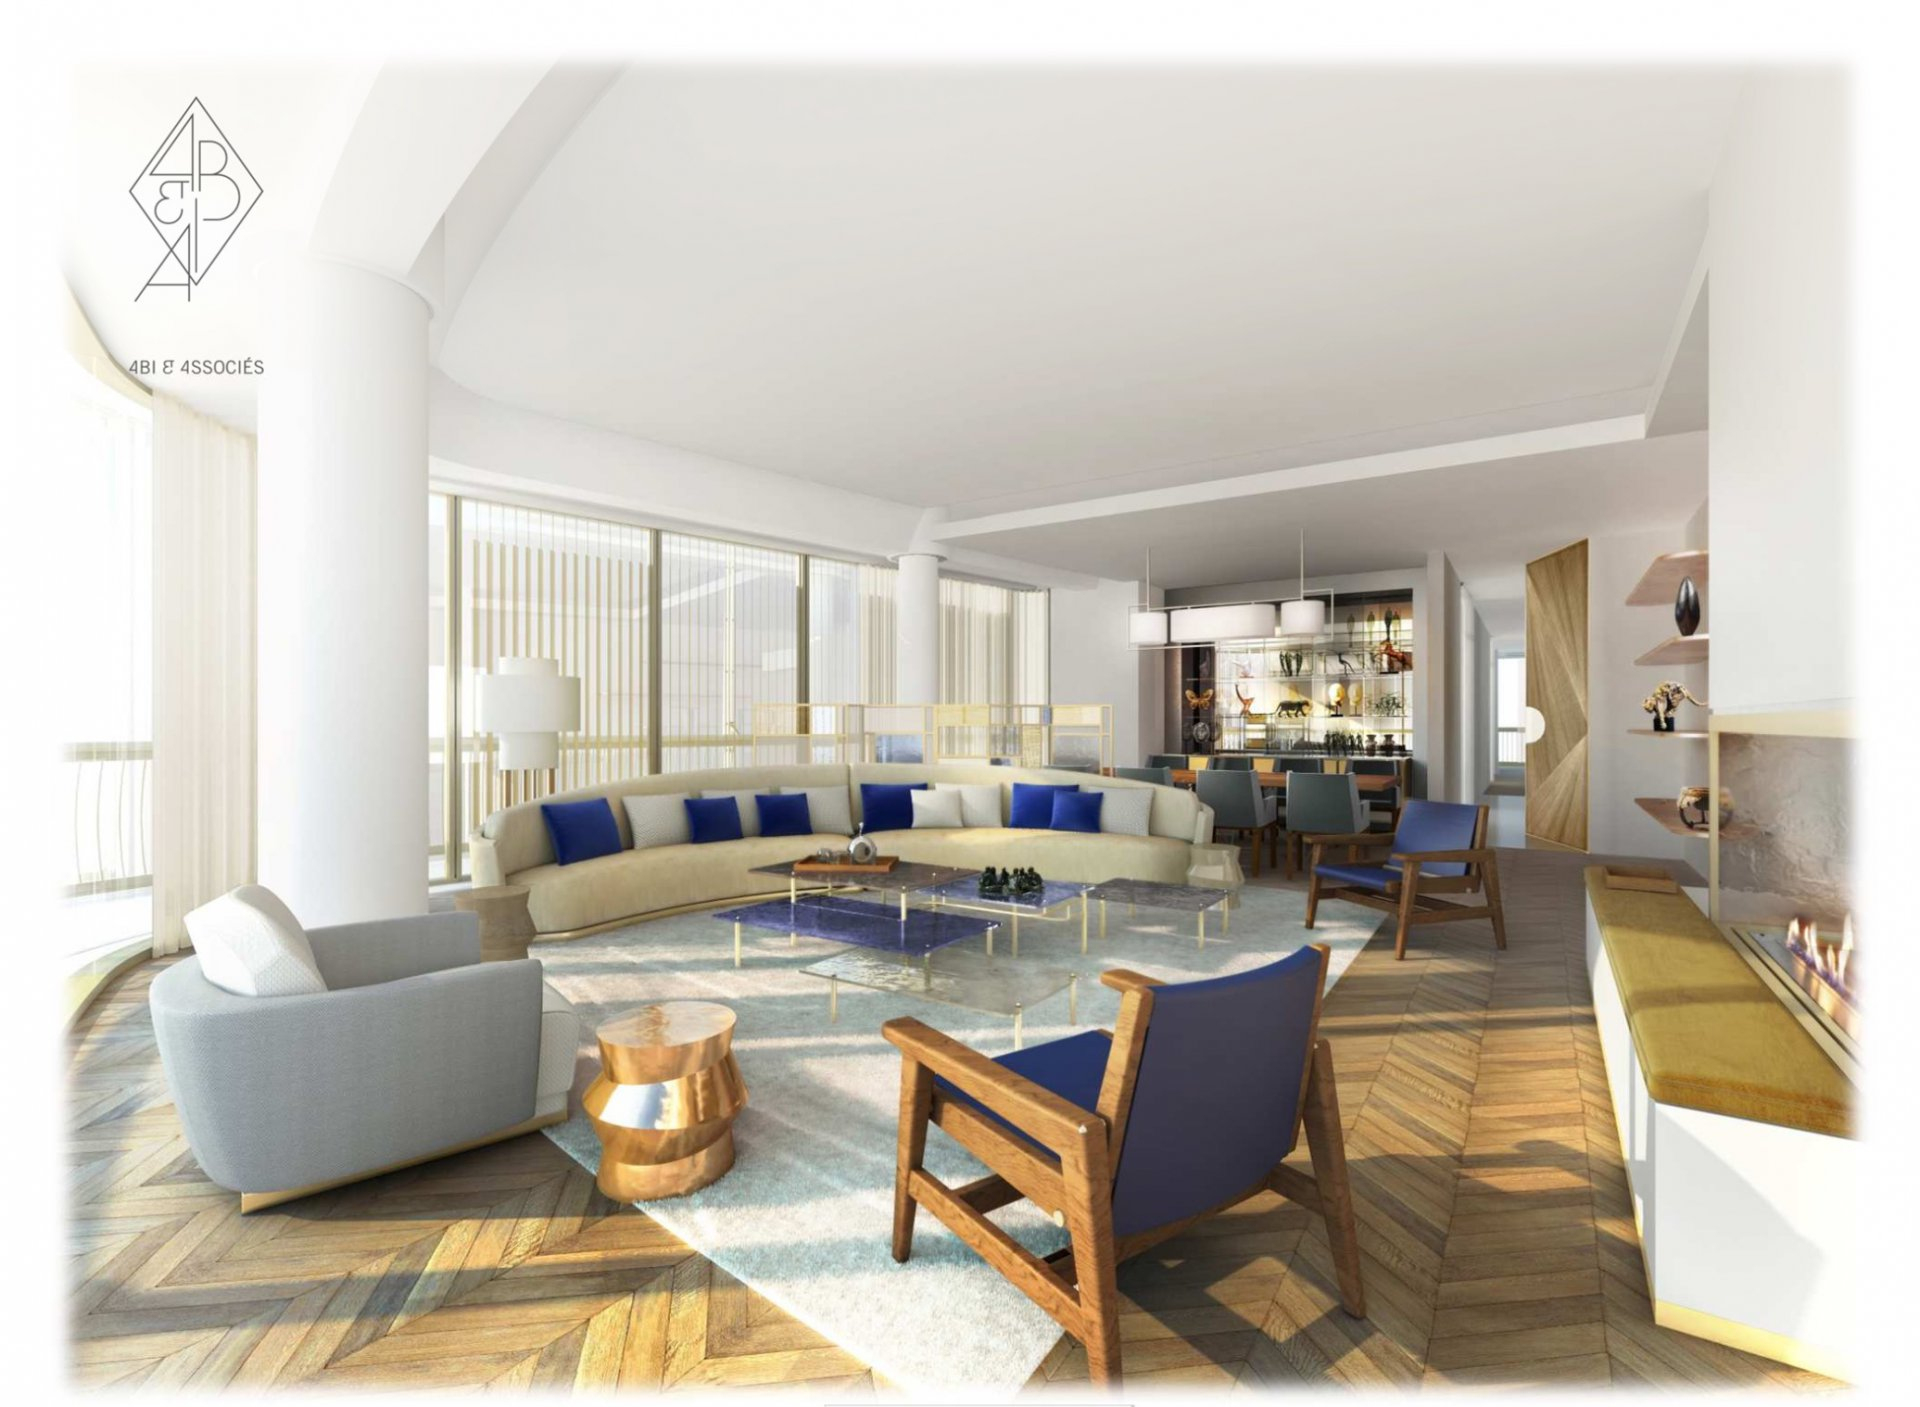 Для Аренды - Apartments In Hotel Residence For Rent - Monaco ... à Studio De Jardin Habitable